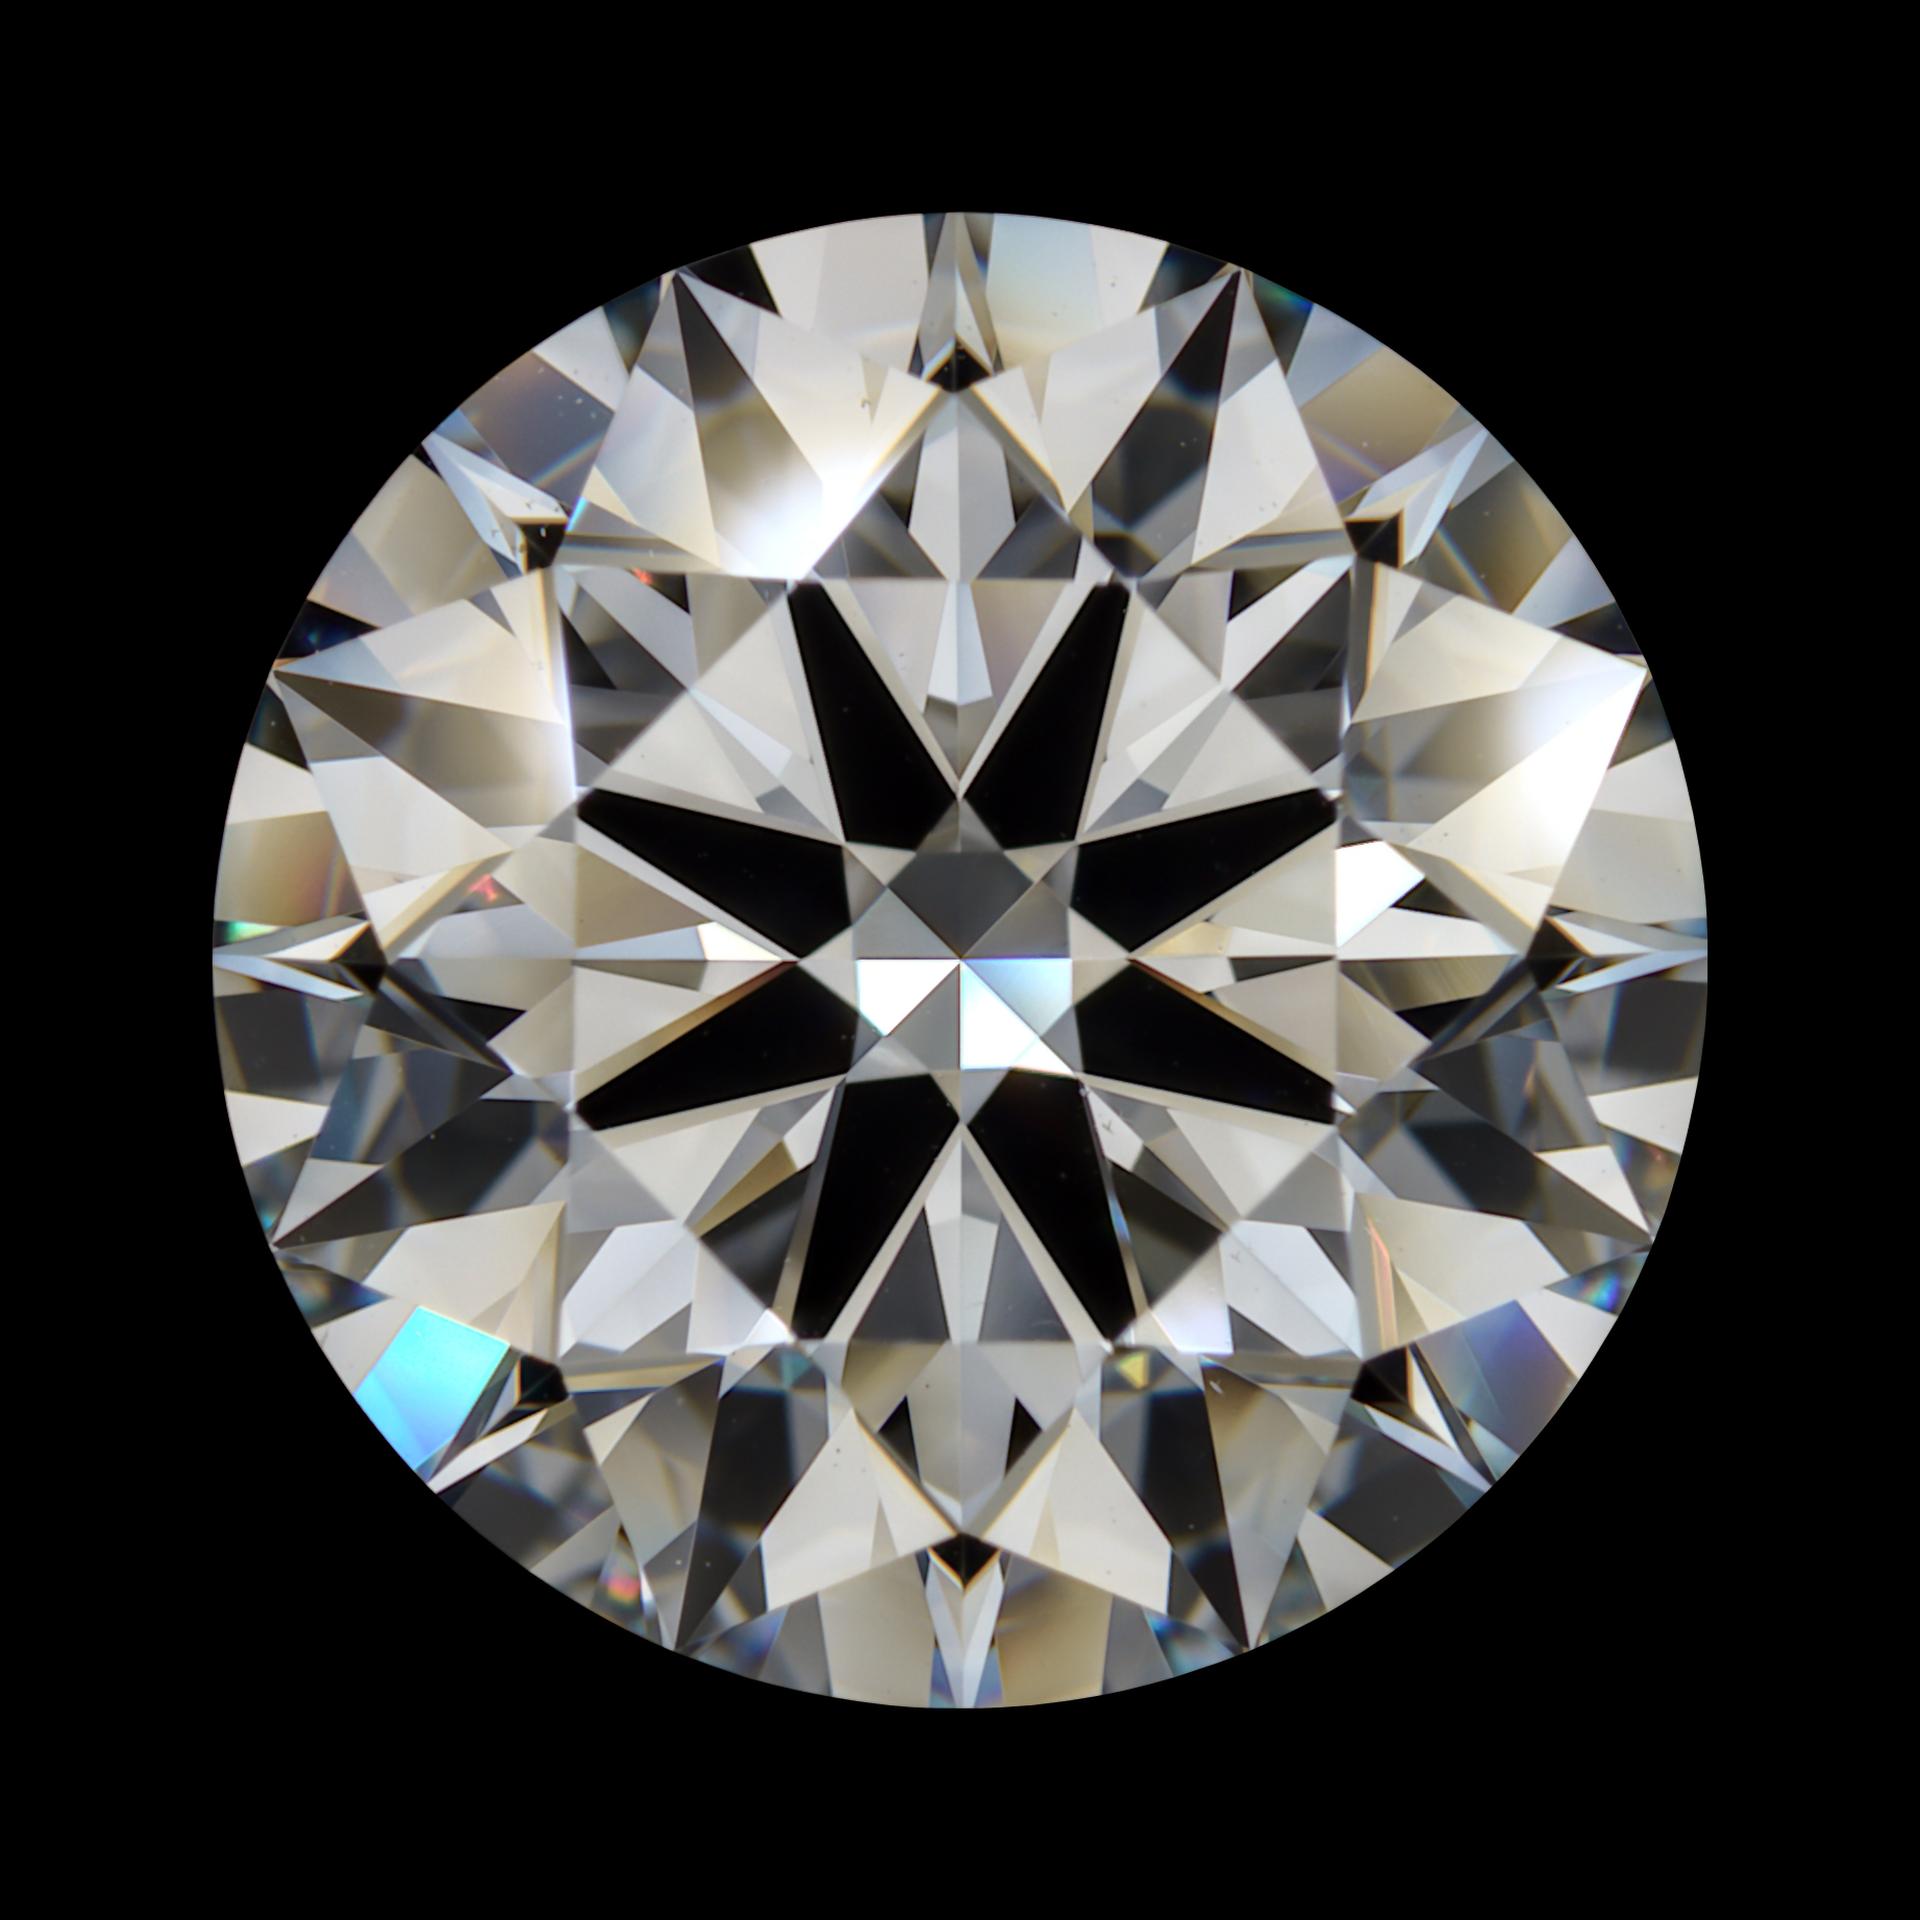 https://cdn.briangavindiamonds.com/files/mp4/BKAGS-104110952001/BKAGS-104110952001-Office-02.mp4